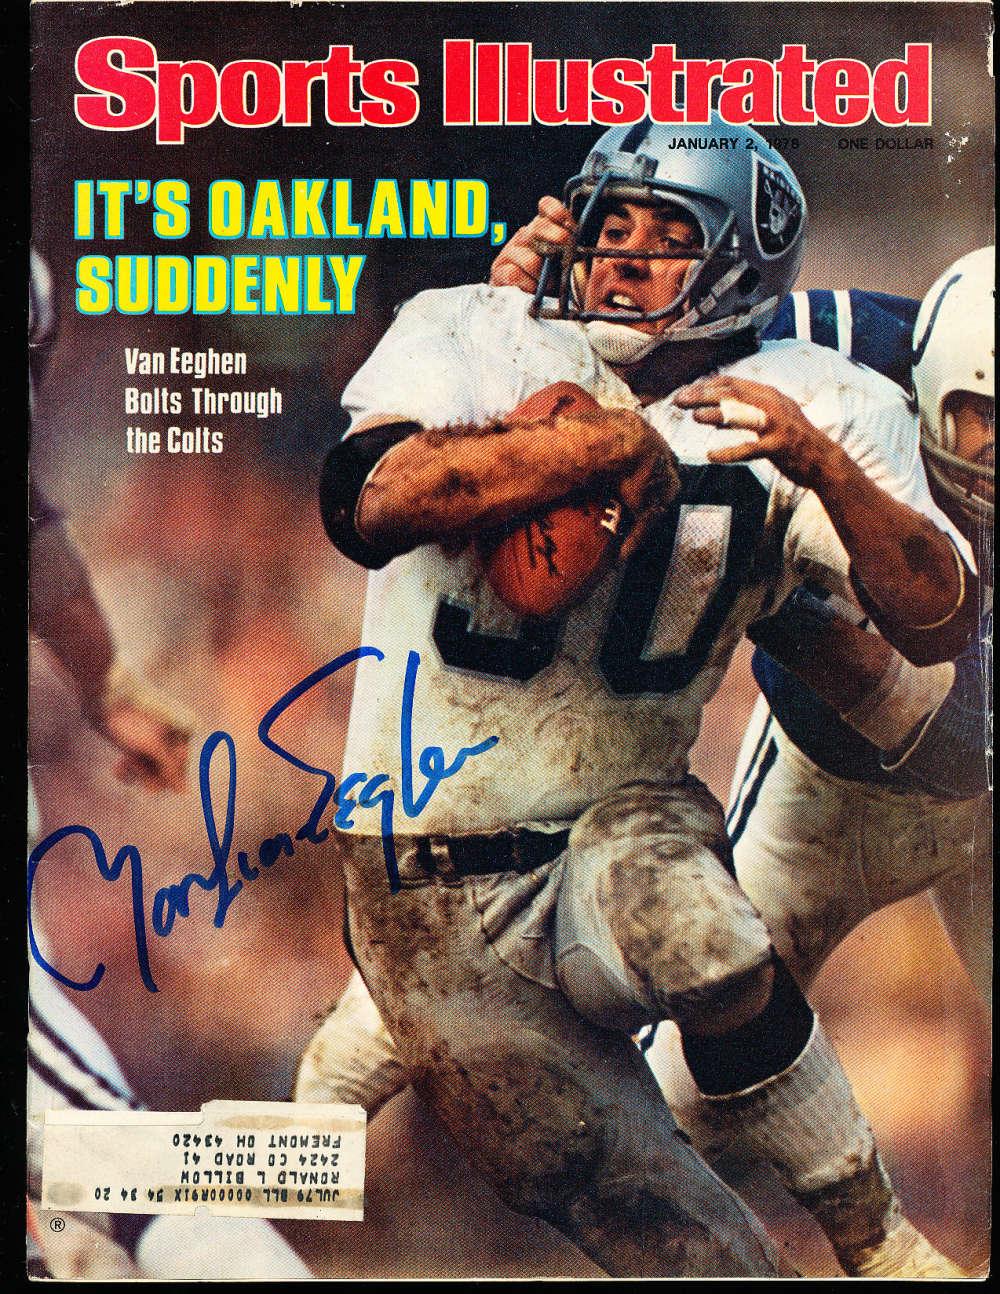 1/2 1978 Martin Van Eeghen Raiders Signed Sports Illustrated